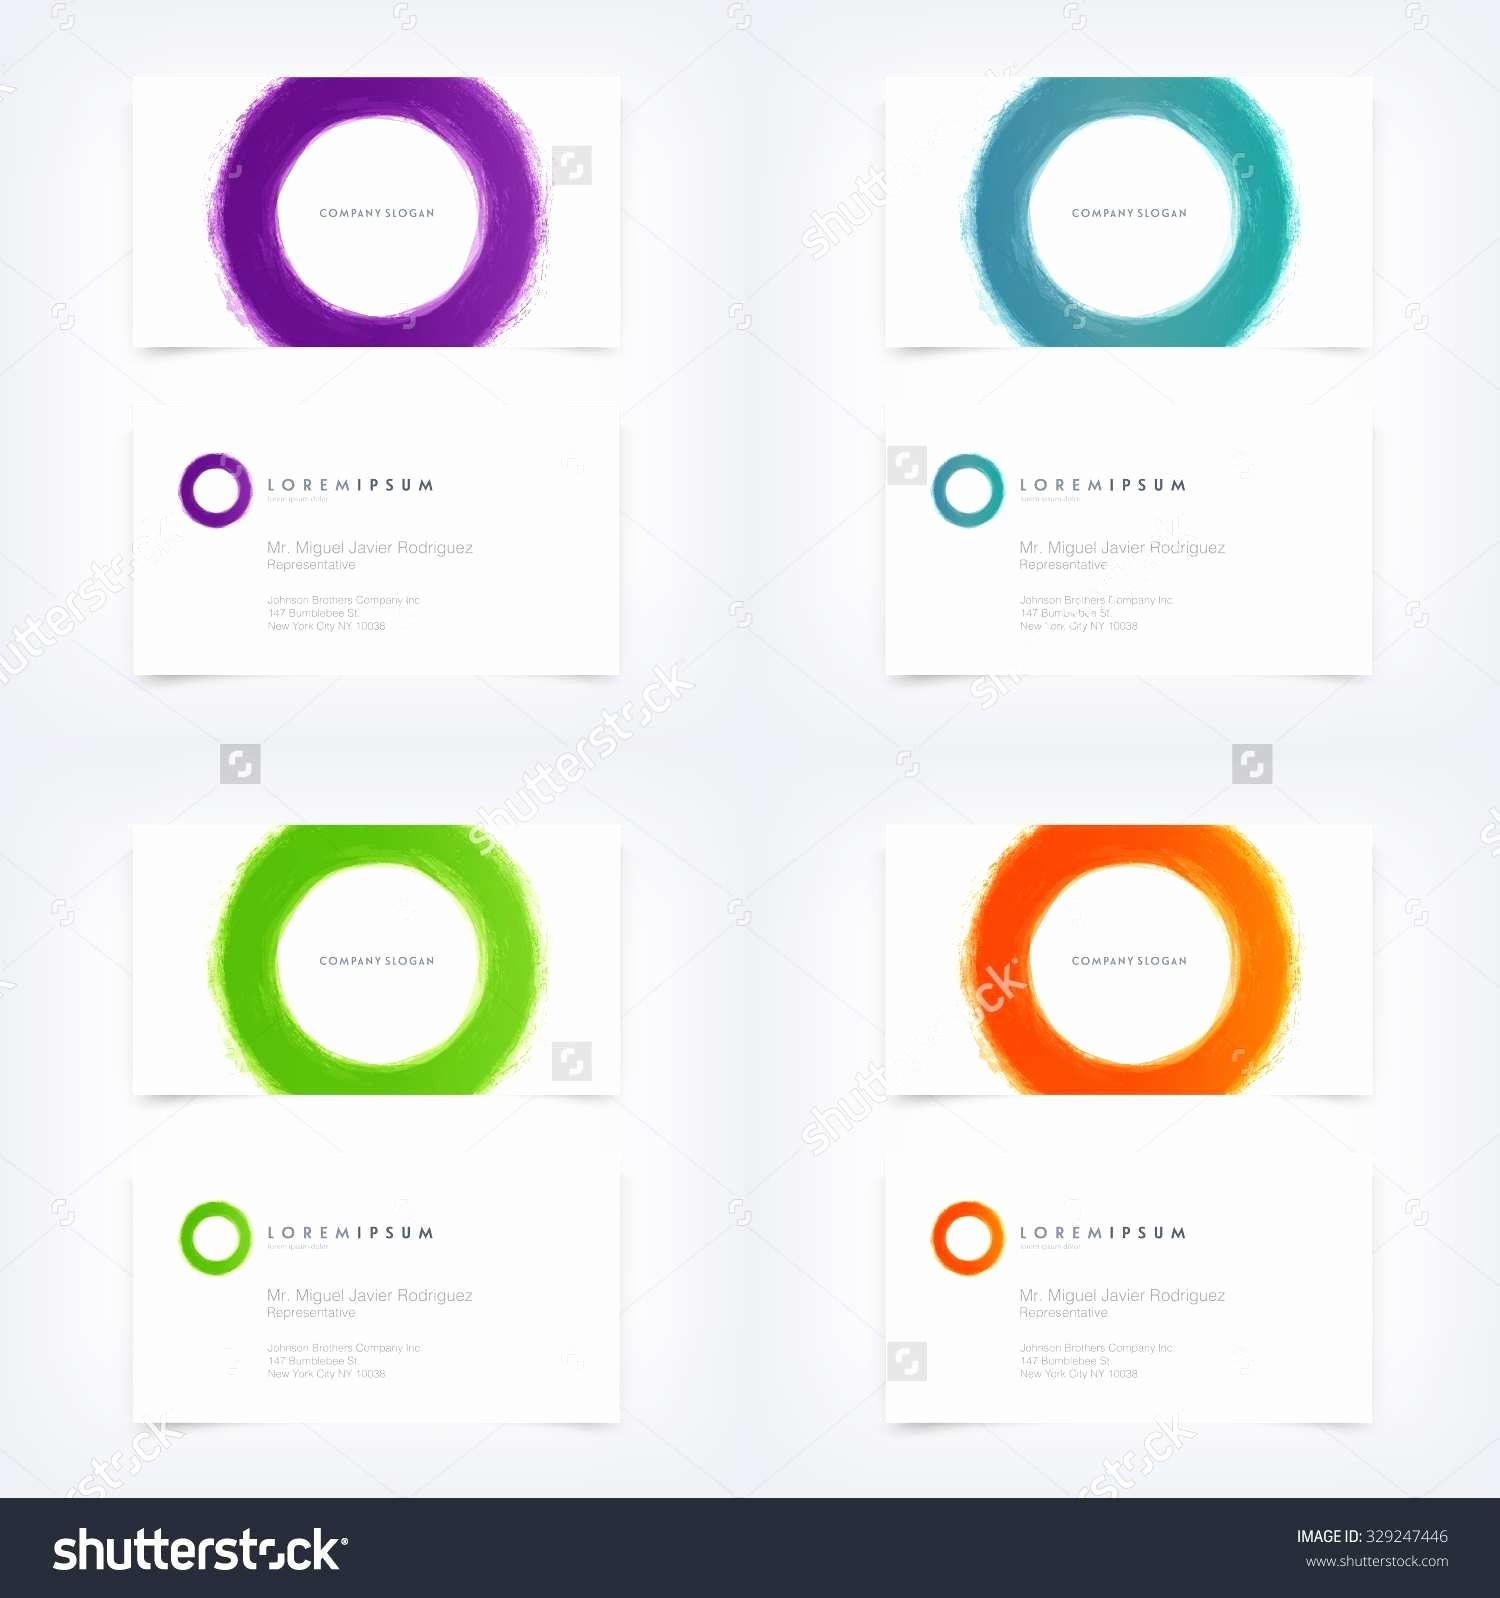 Polka Dot Template for Word Inspirational Contemporary Polka Dot Template Free Professional